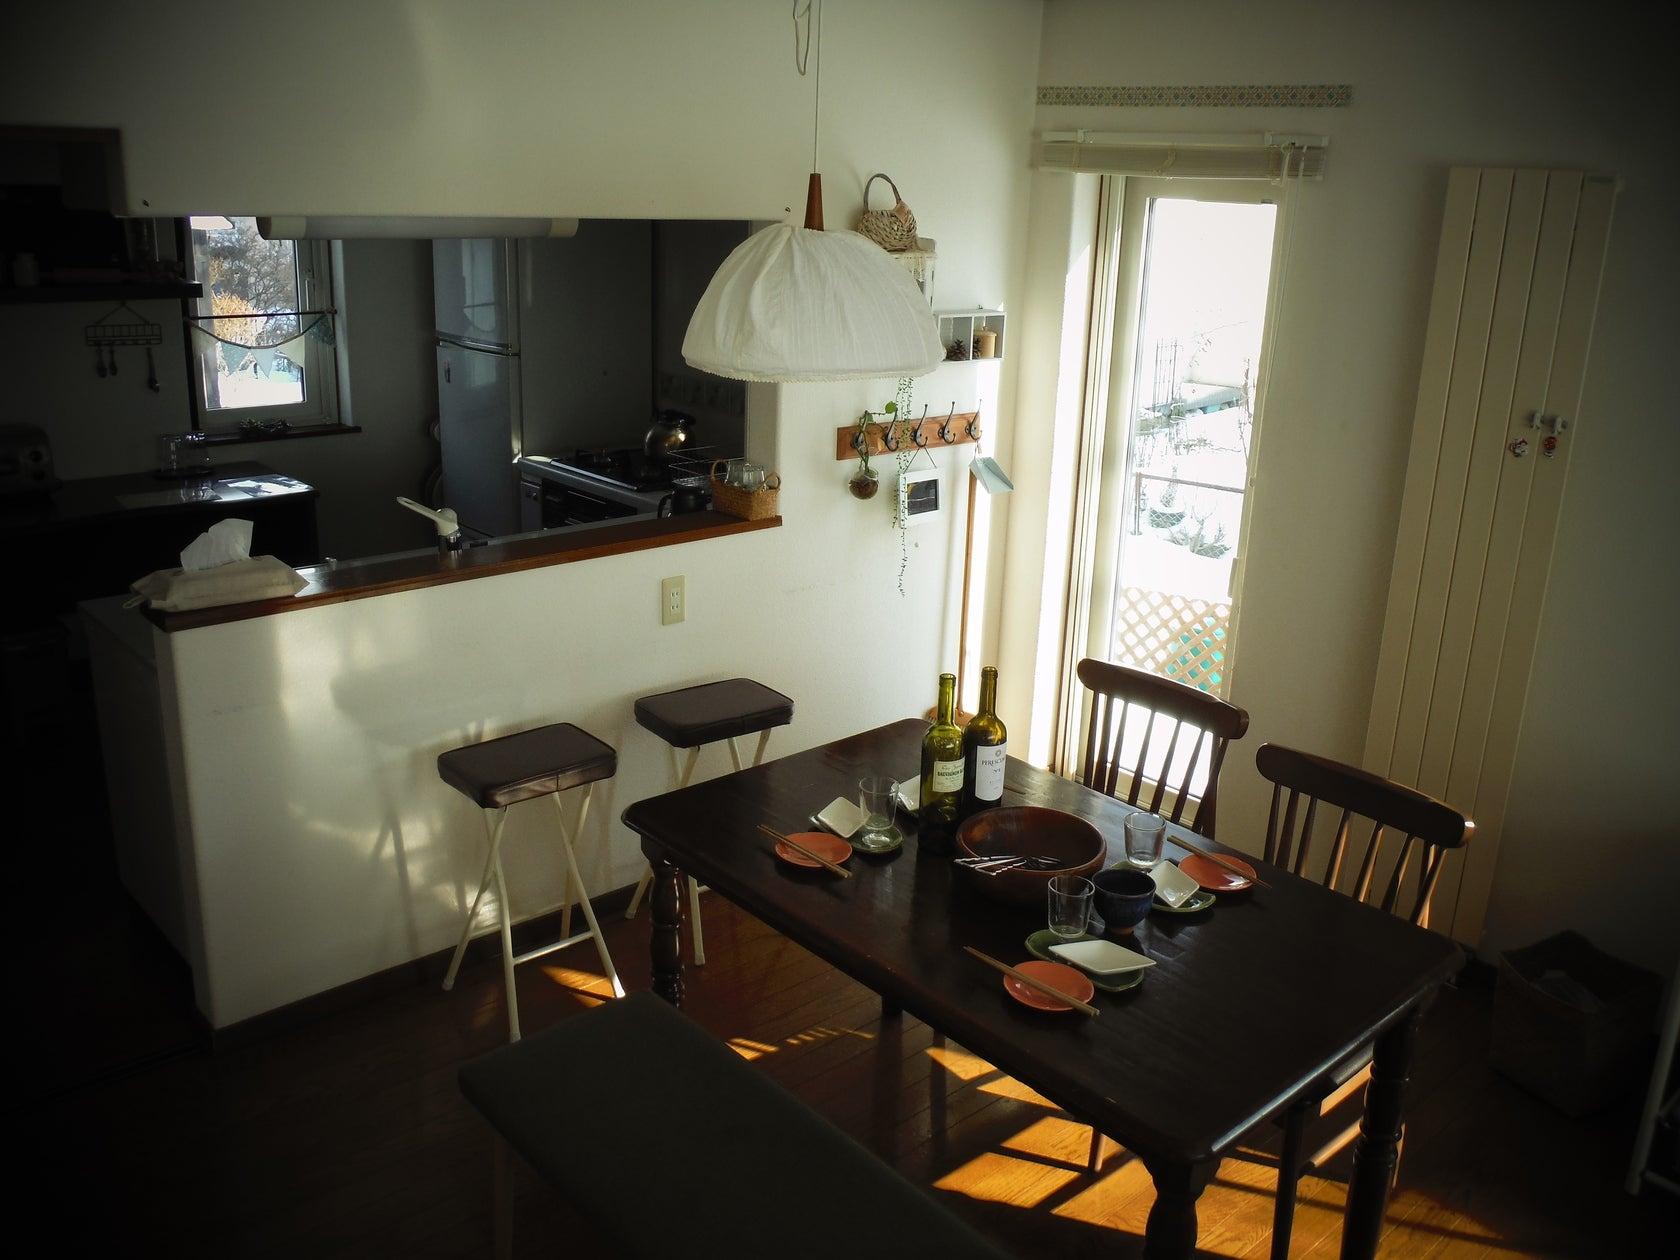 『memori』貸別荘(宿泊可)♪キッチン+リビングダイニング+和室♪パーティー等に♪ の写真